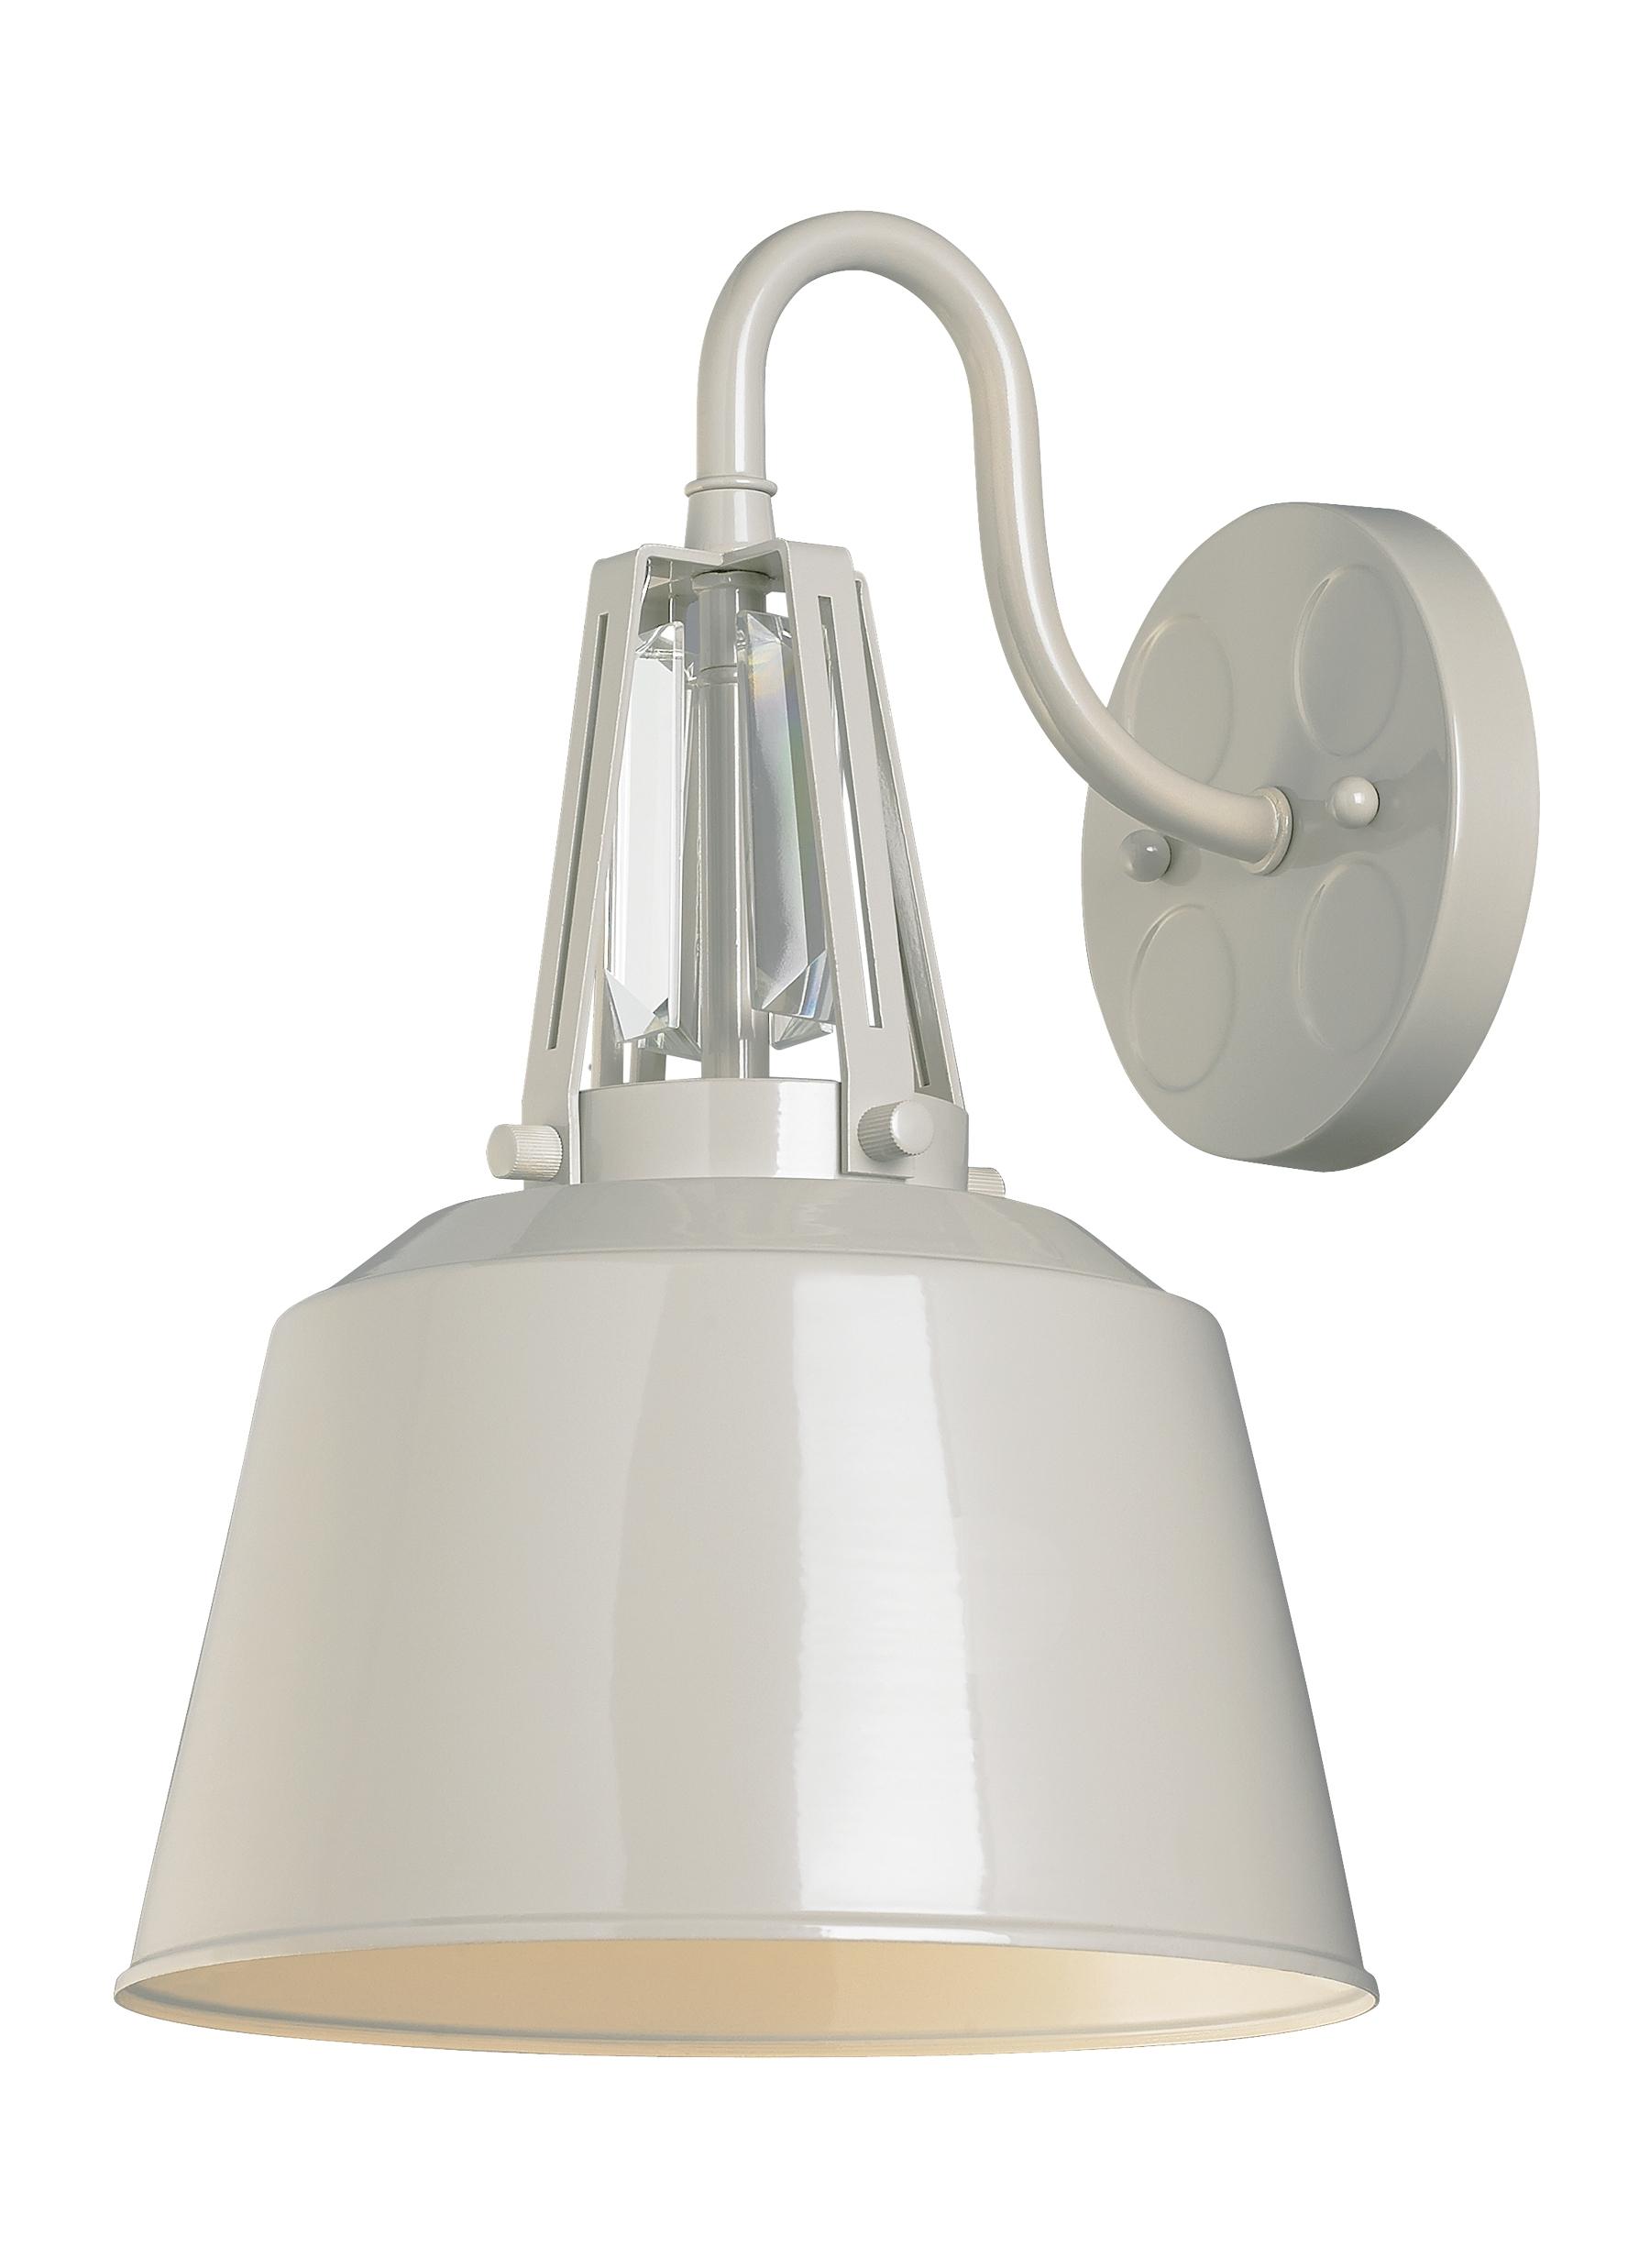 Ol15002Hgg,1 – Light Outdoor Lantern,hi Gloss Grey Within Most Recent Outdoor Grey Lanterns (Gallery 17 of 20)